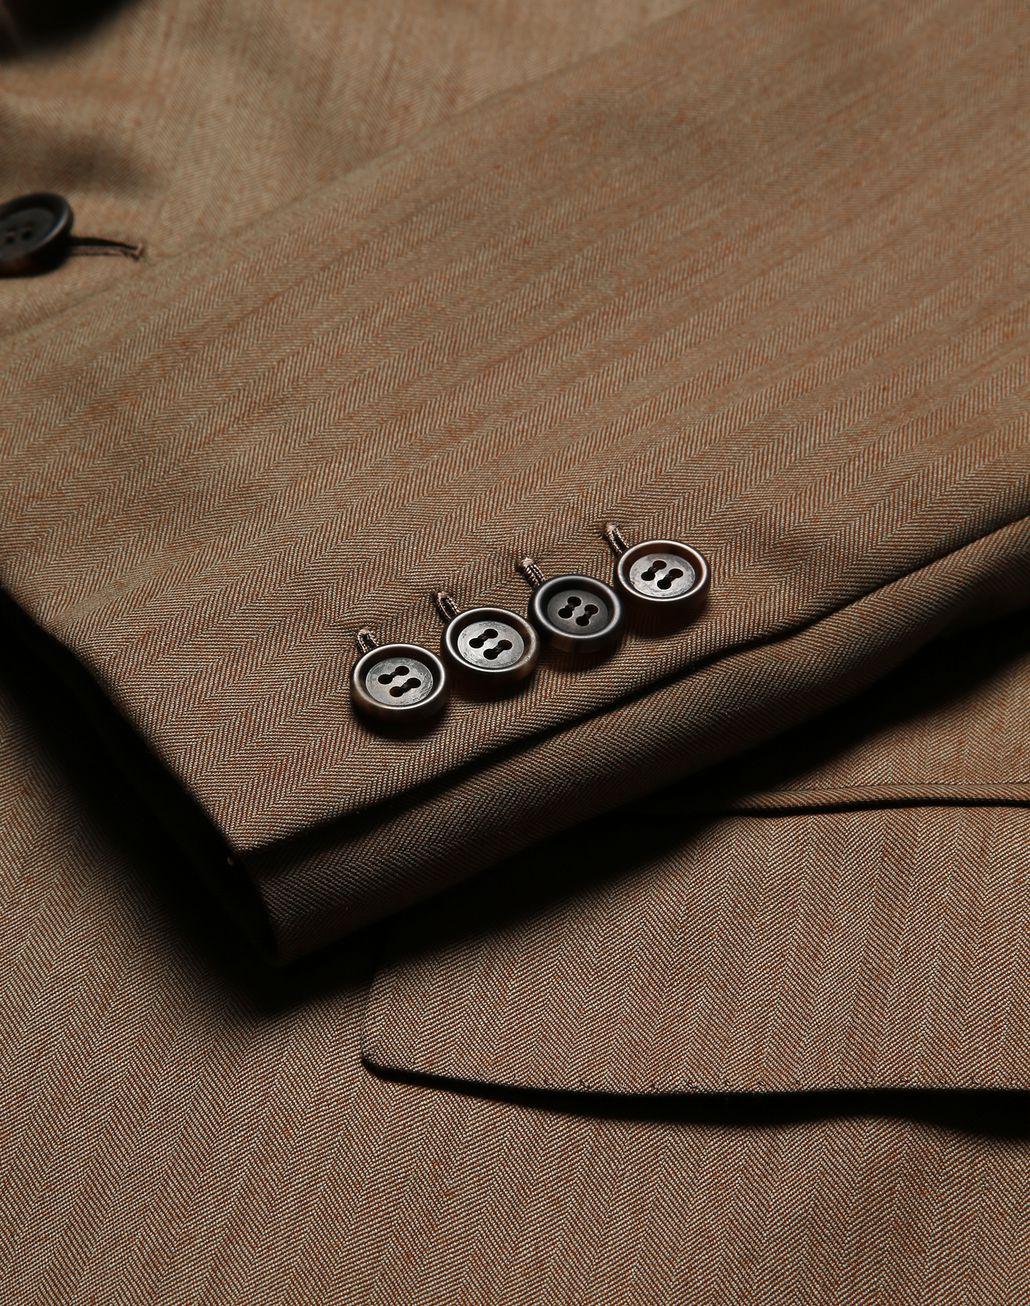 BRIONI Camel Herringbone Parioli Suit Suits & Jackets Man a